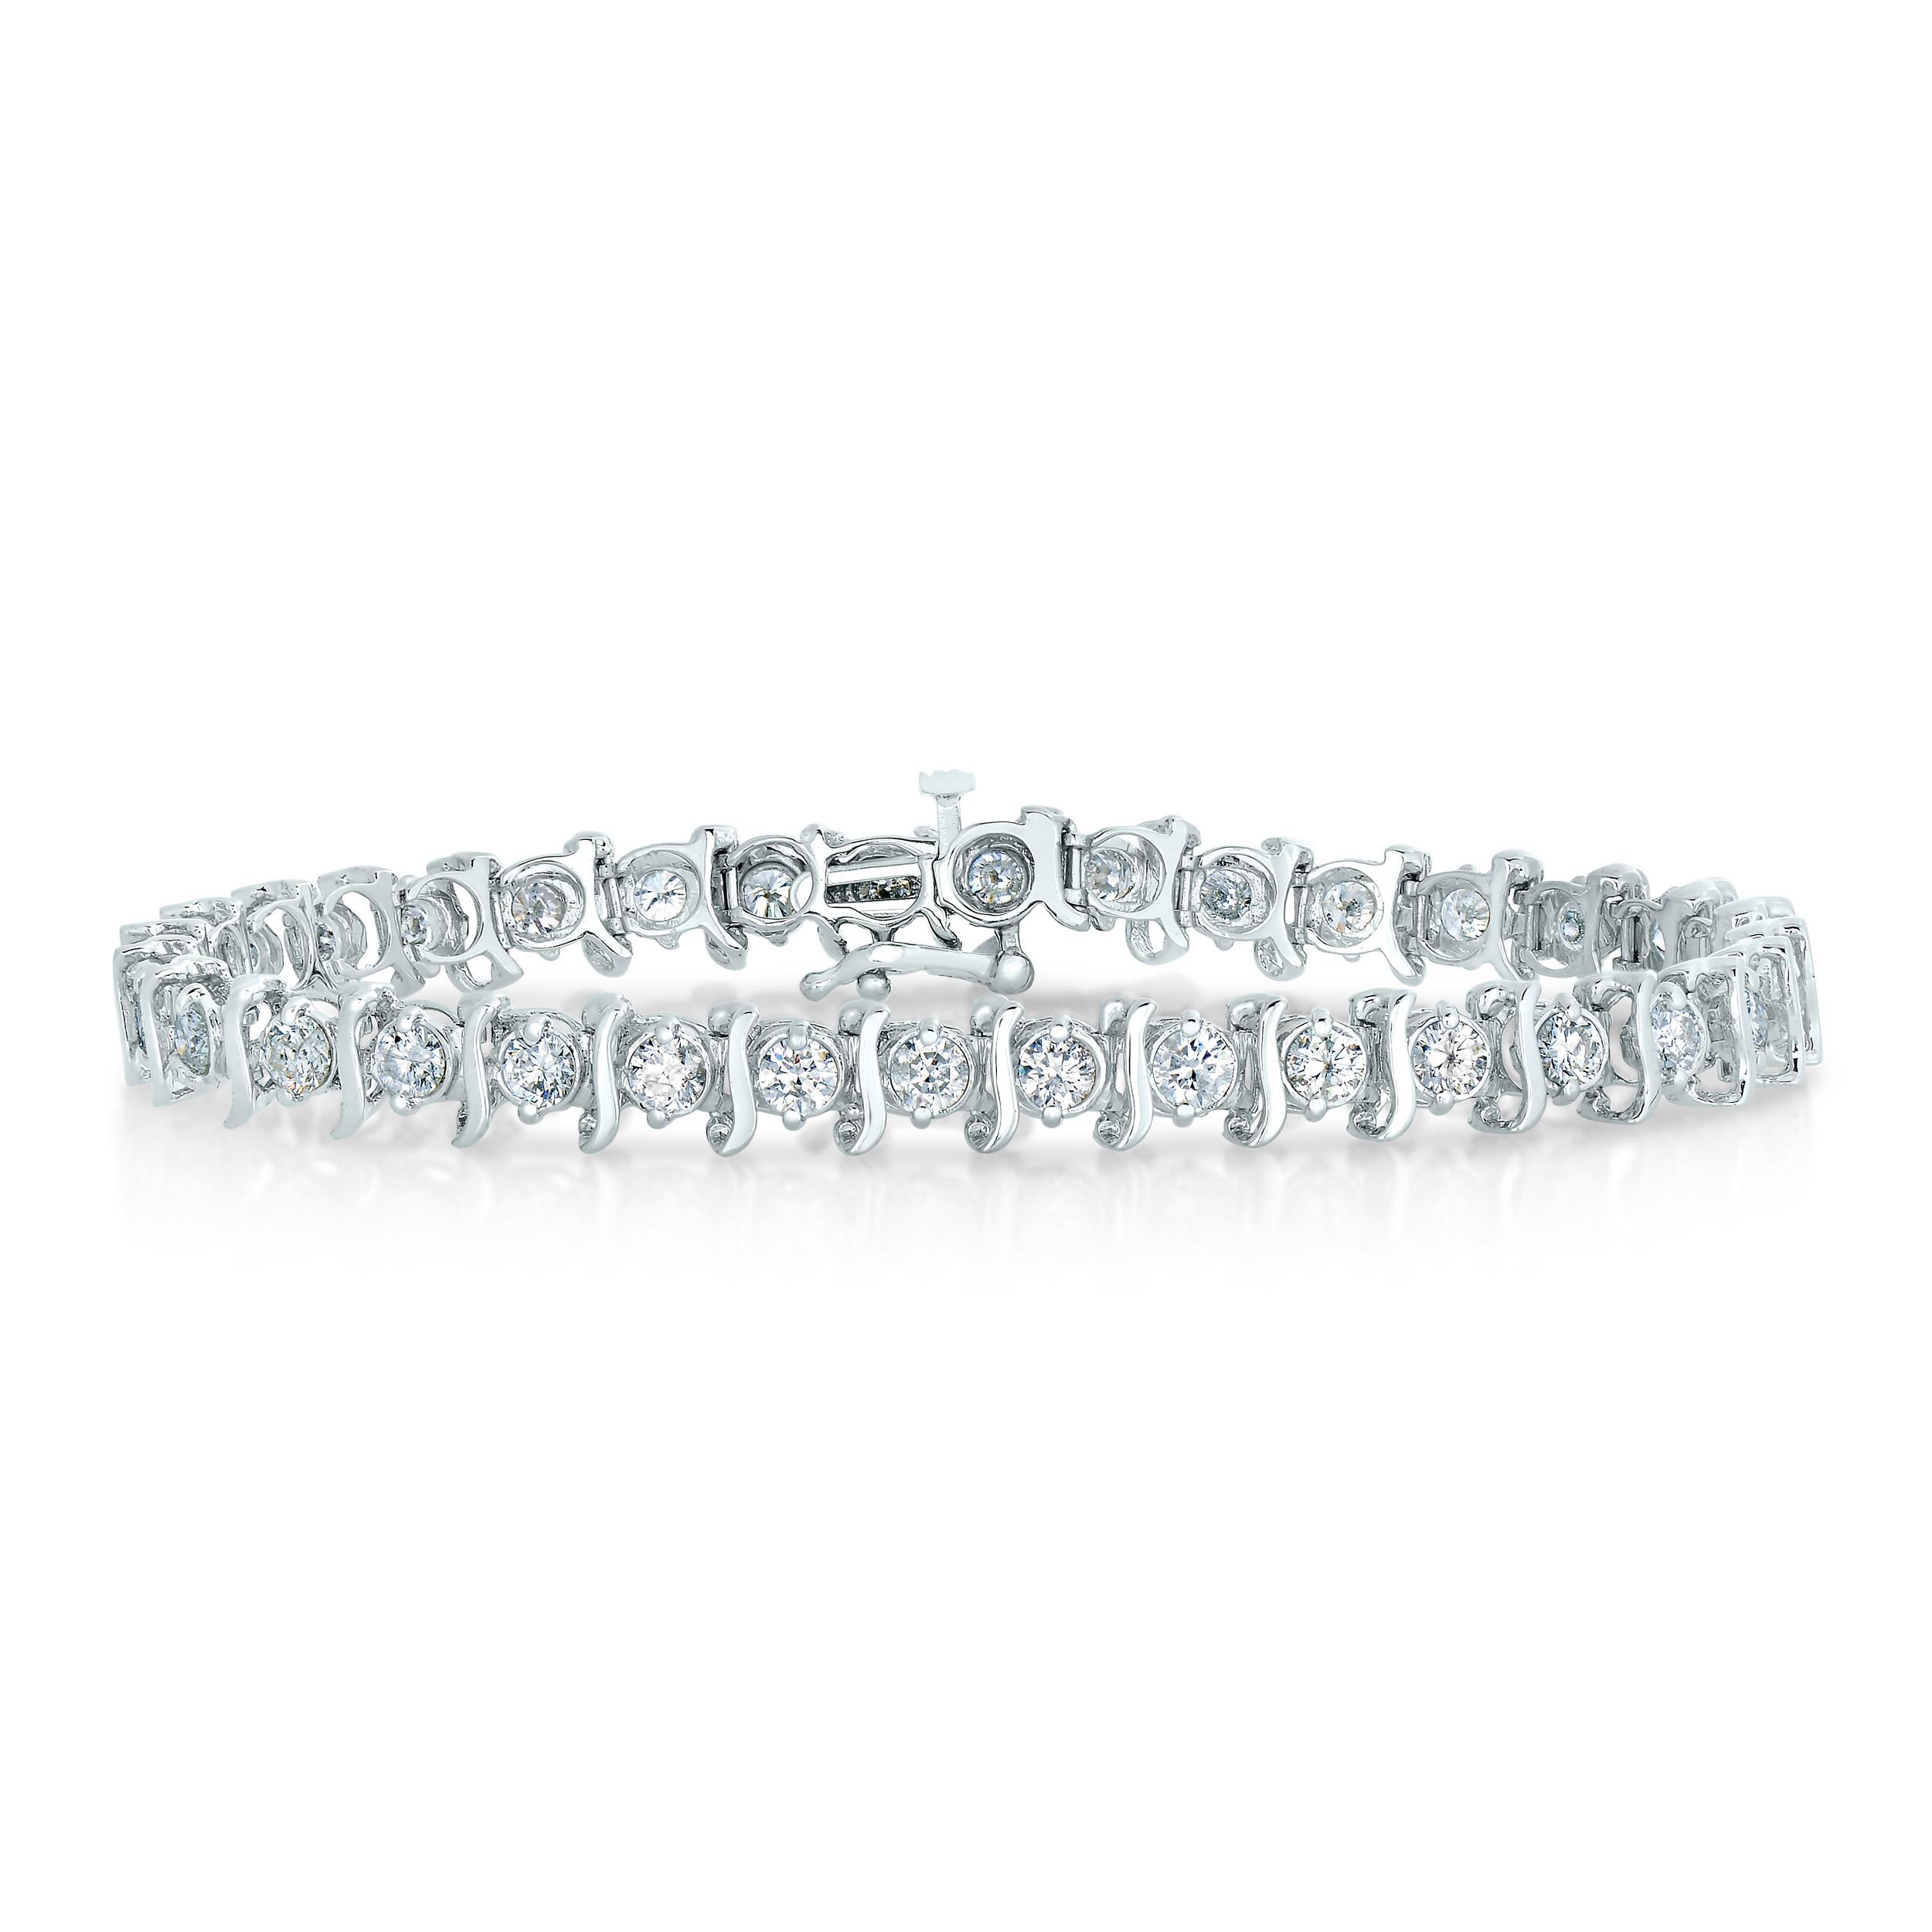 4 Ct Ags Certified Si2 I1 14k White Gold Diamond Bracelet L M Ebay